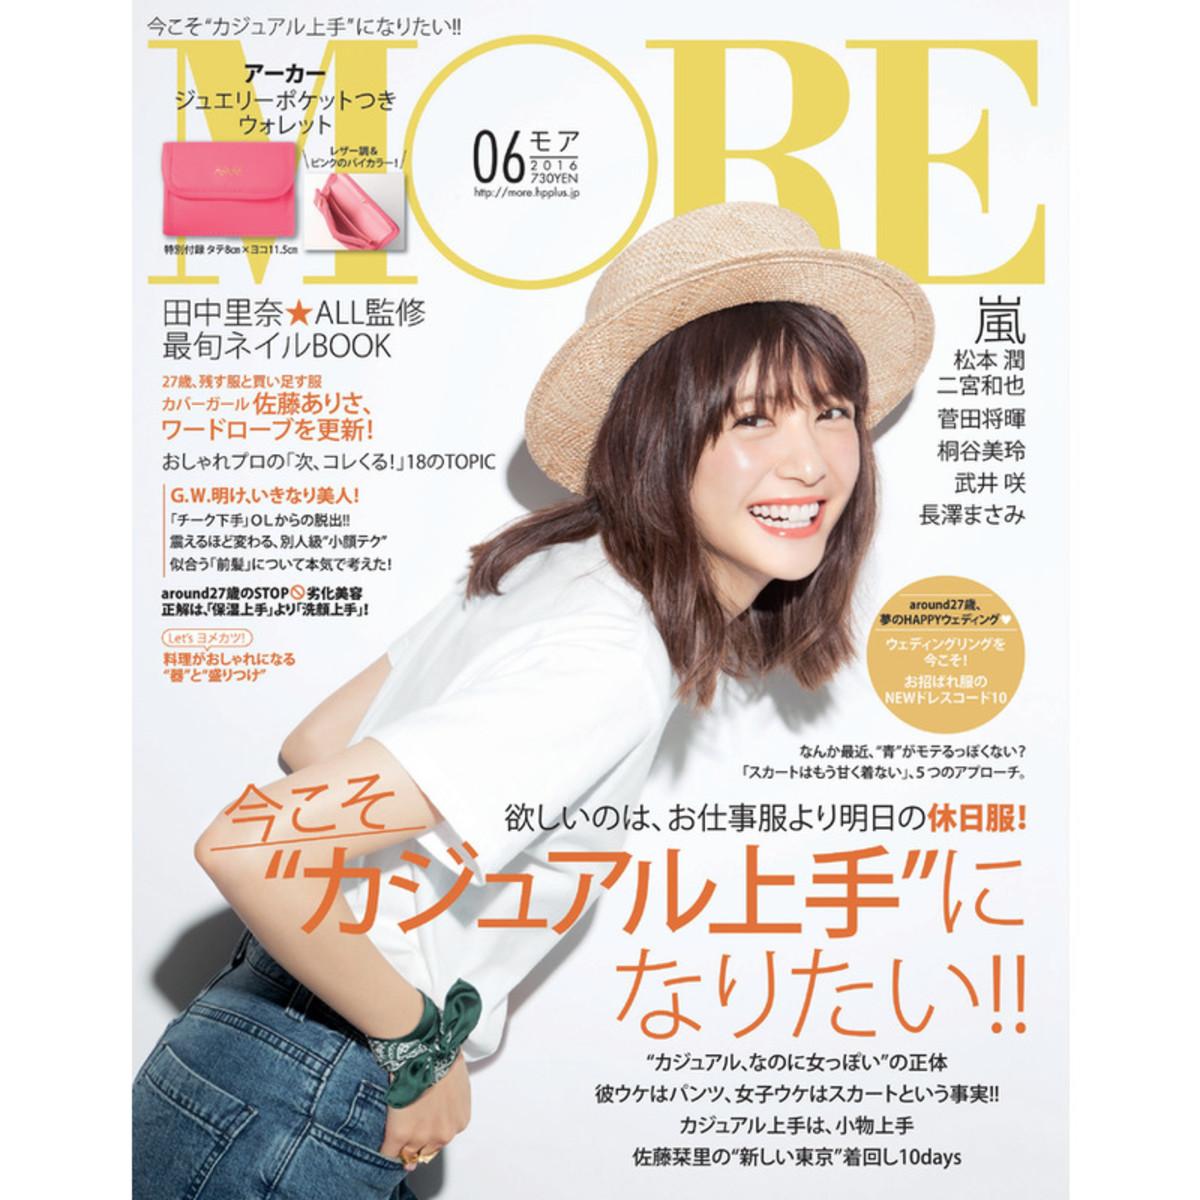 10 Popular Japanese Fashion Magazines For Women  Hubpages-8788